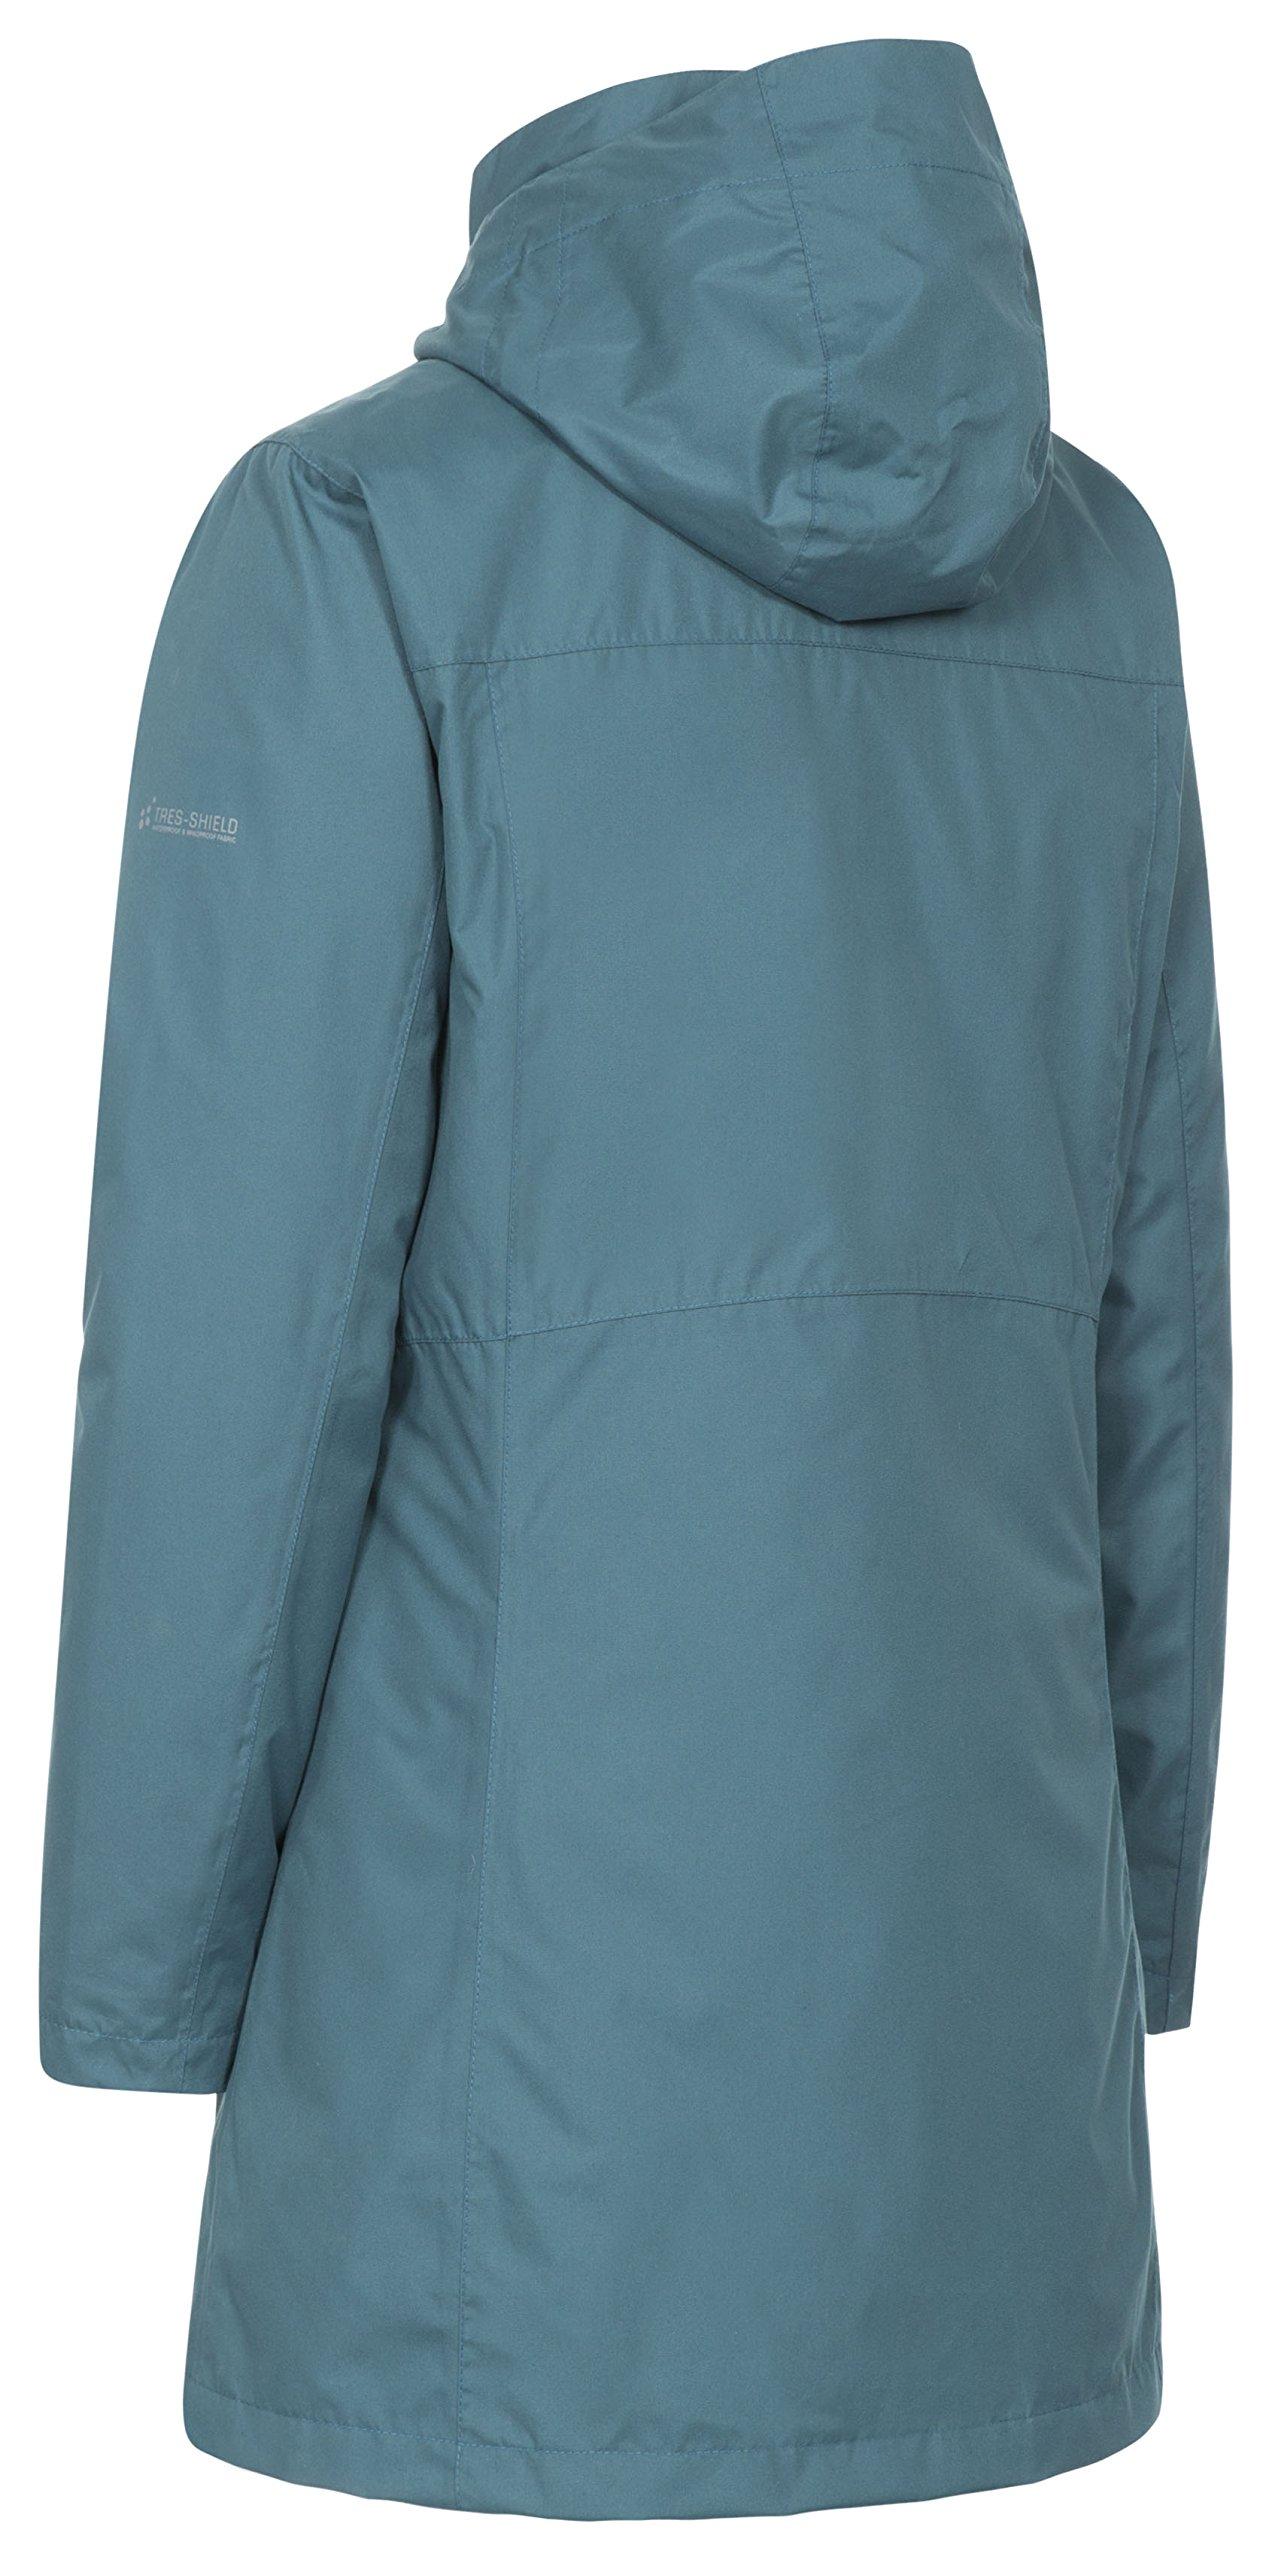 Trespass Alissa II Womens Waterproof 3 in 1 Jacket with Hood 2